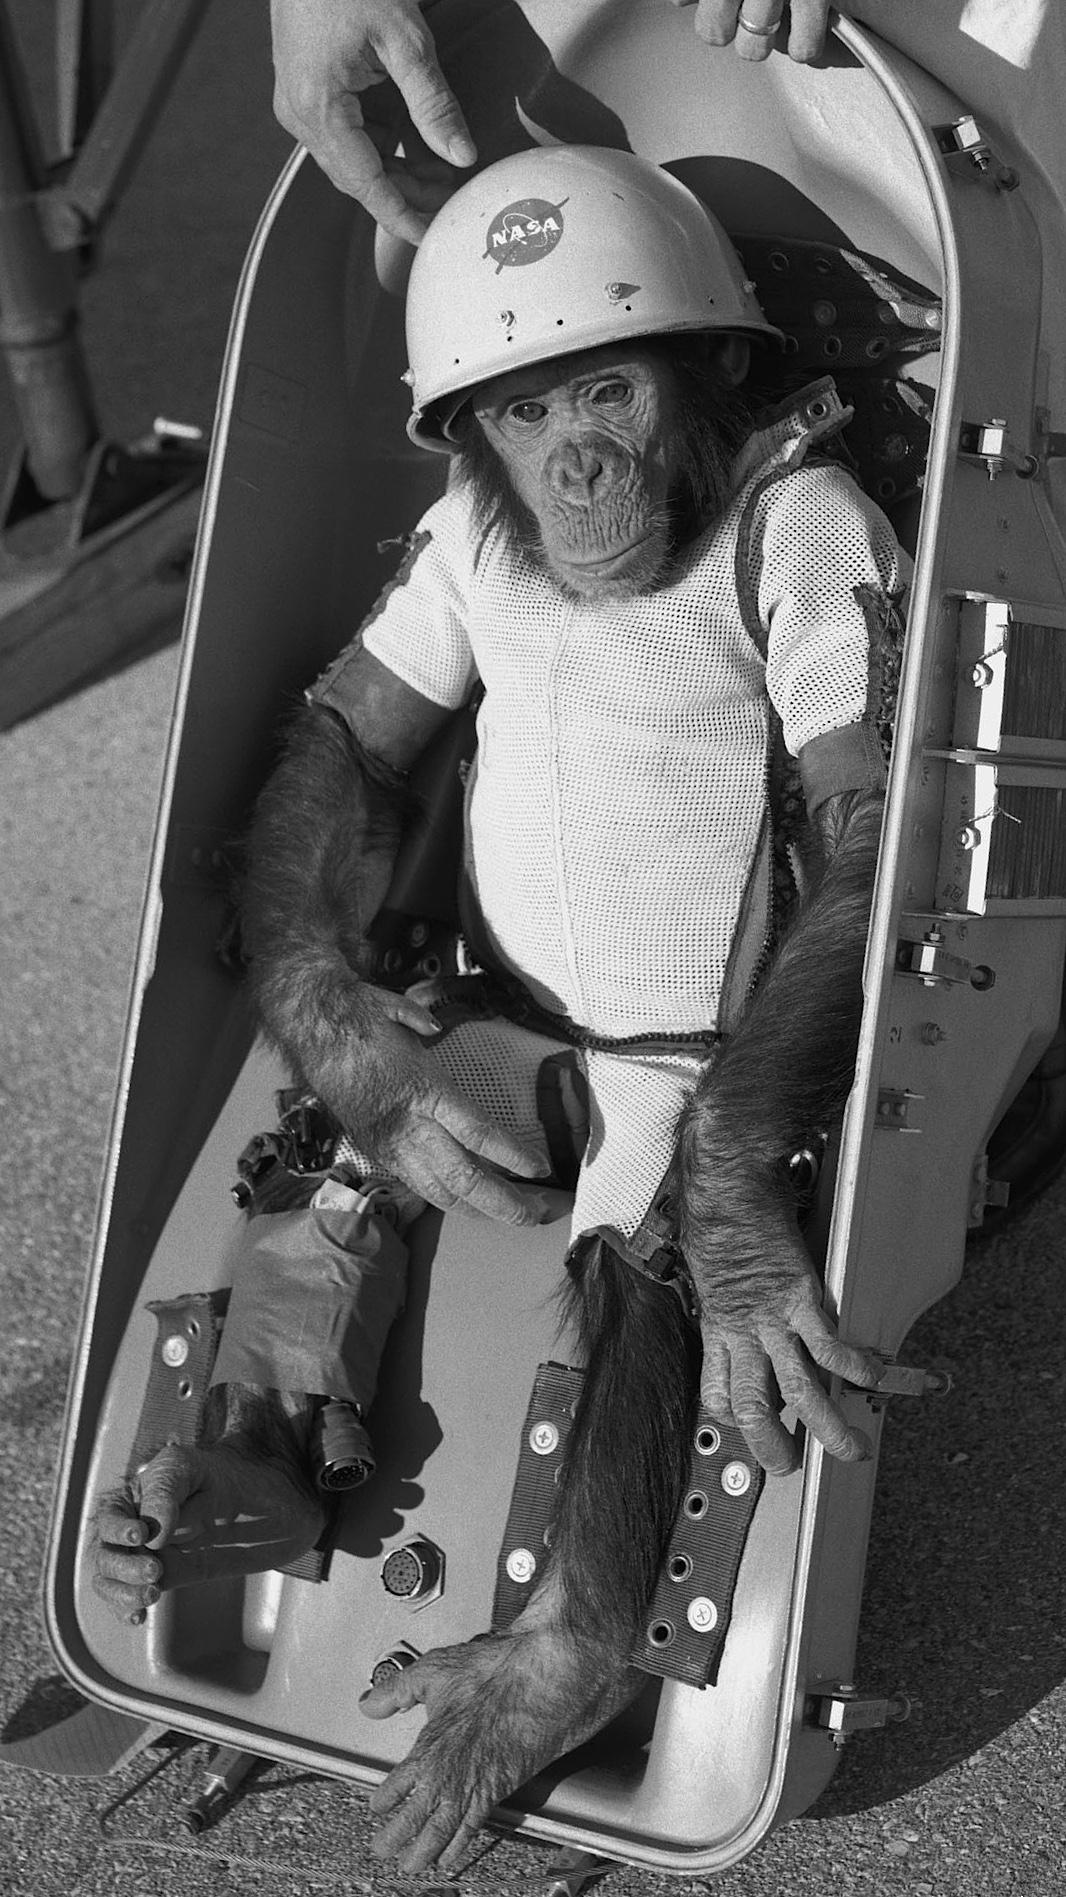 Ham_the_chimp_(cropped).jpg